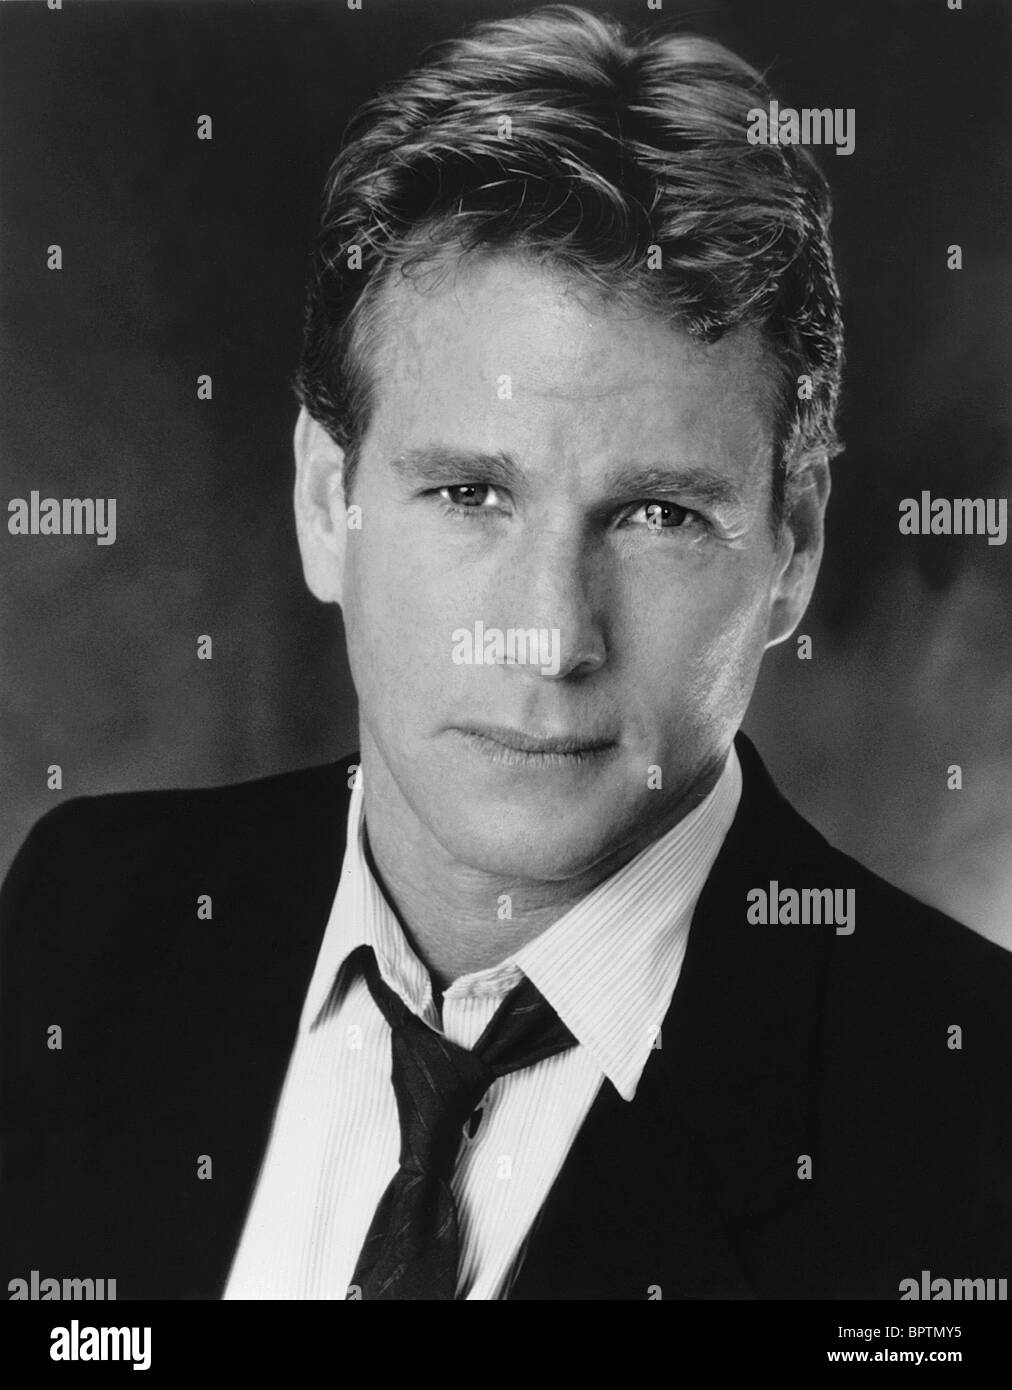 RYAN O'NEAL ACTOR (1978) - Stock Image